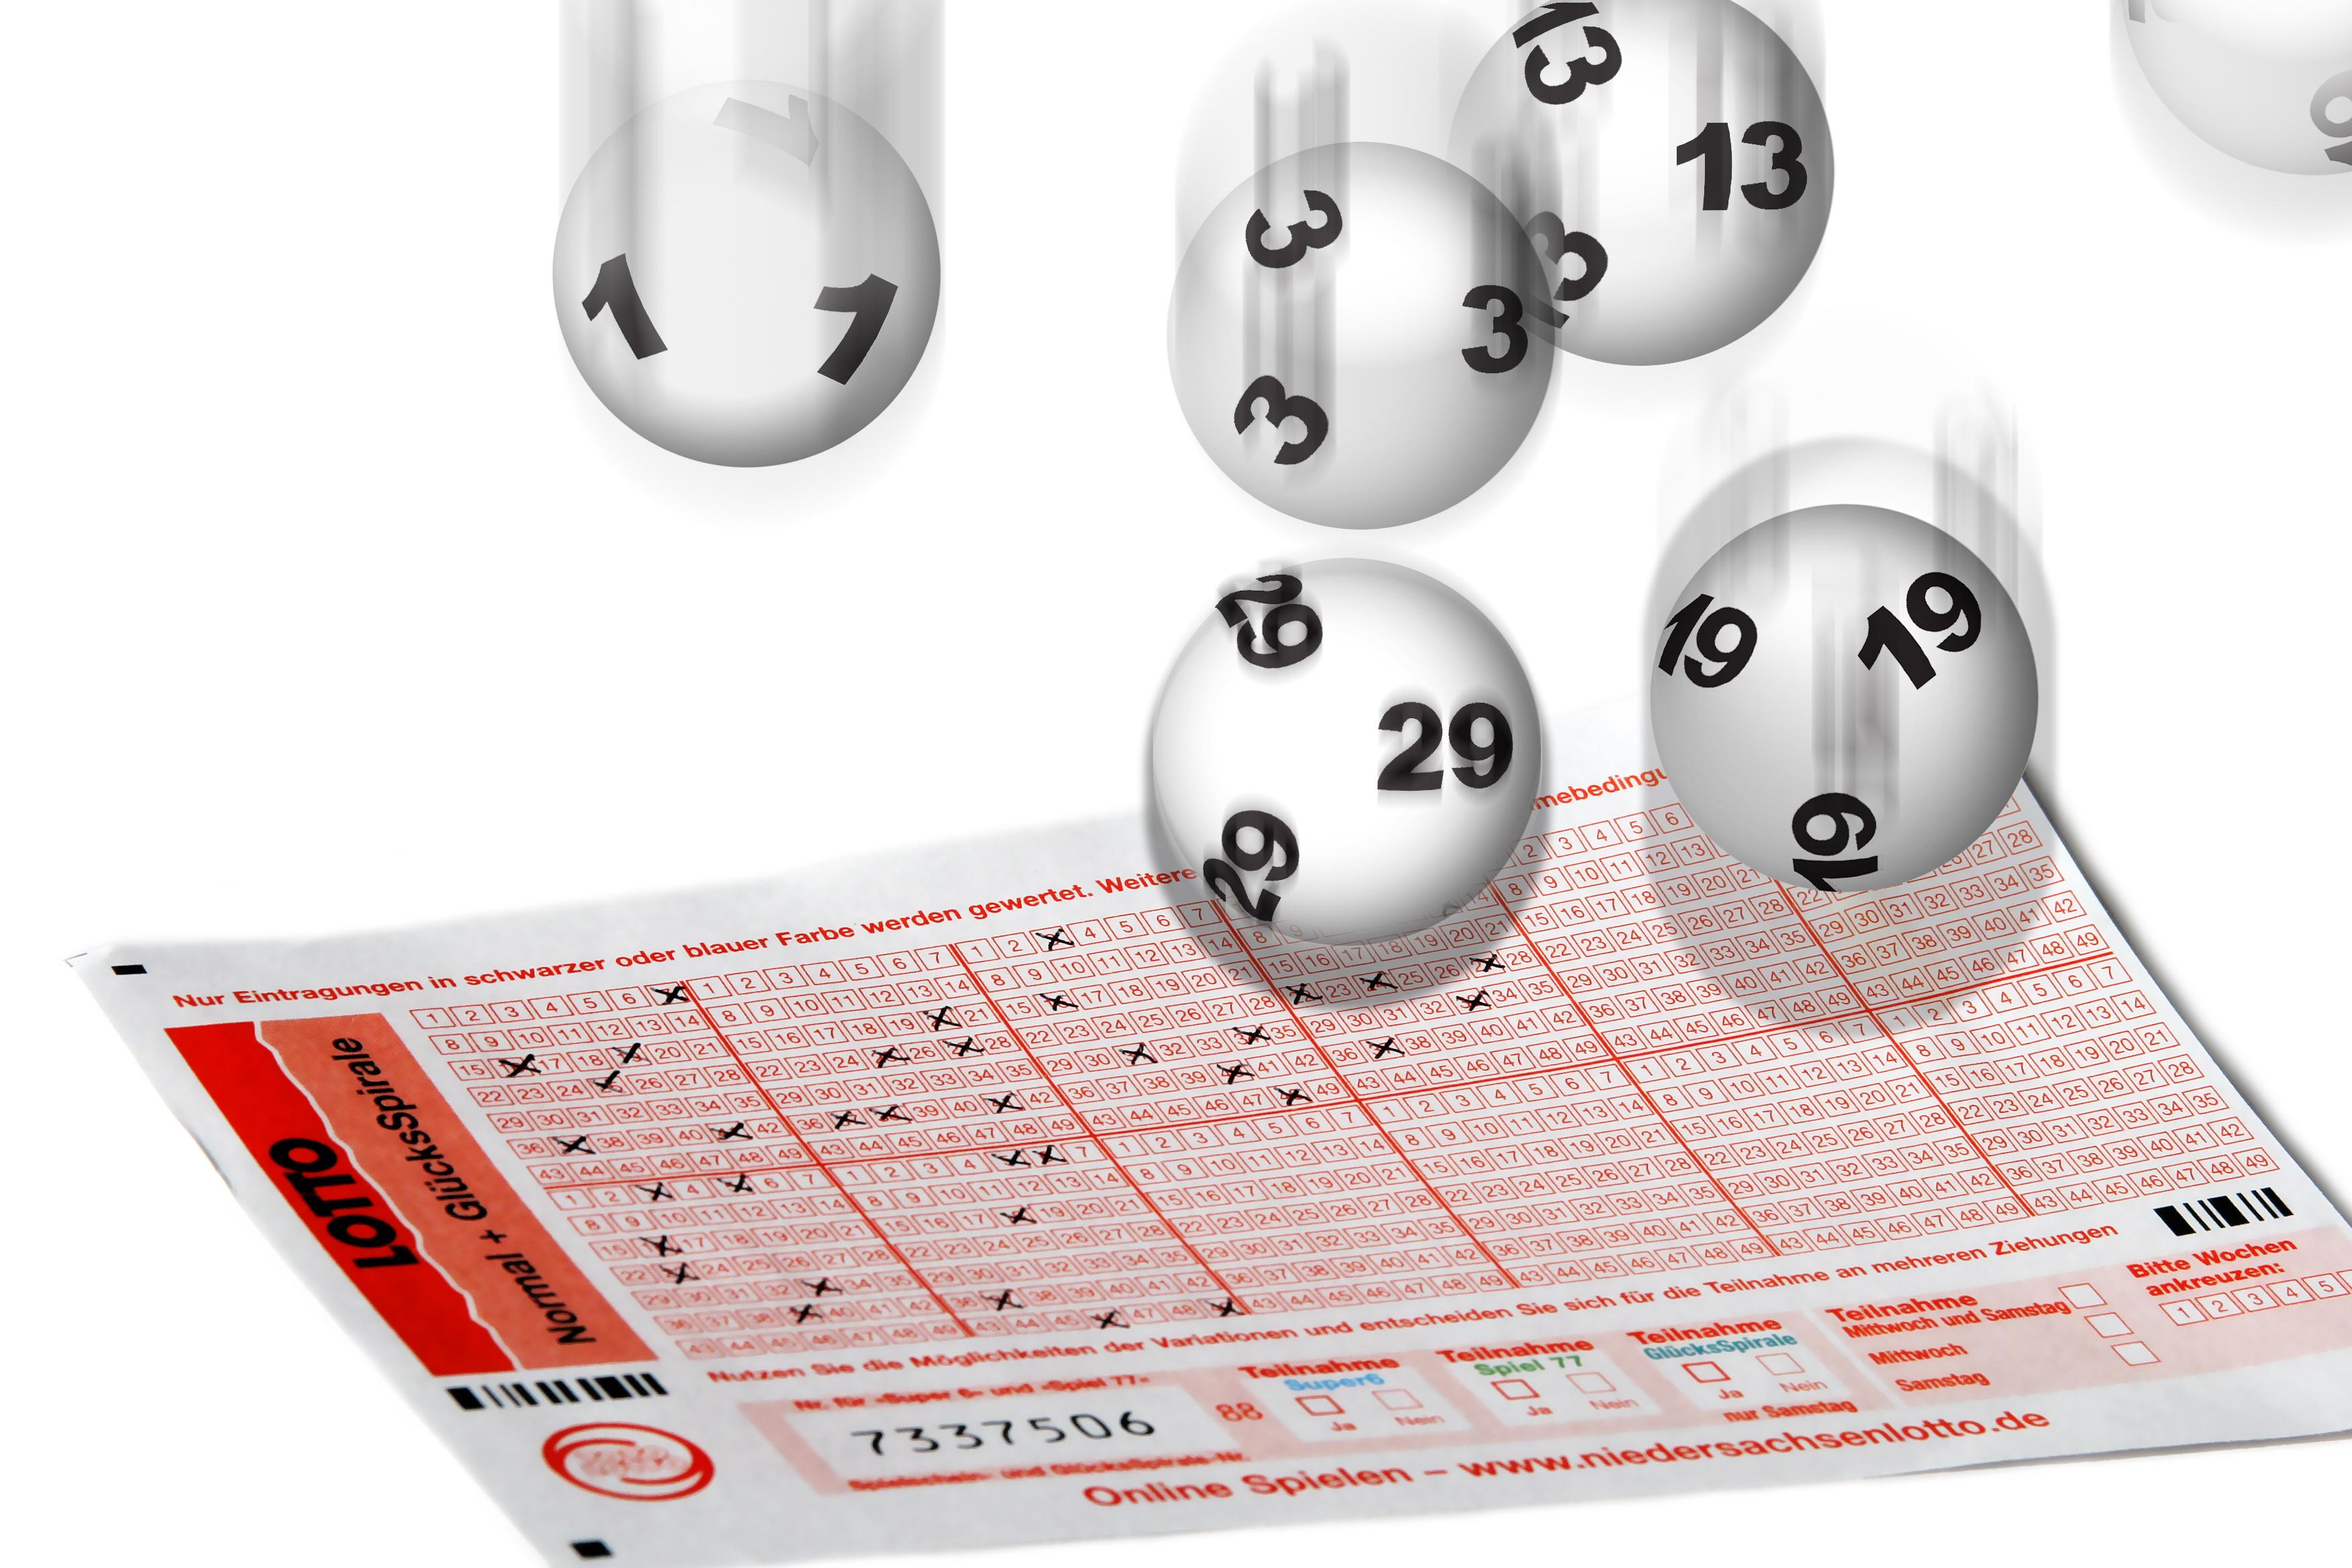 Lottozahlen 5.8 17